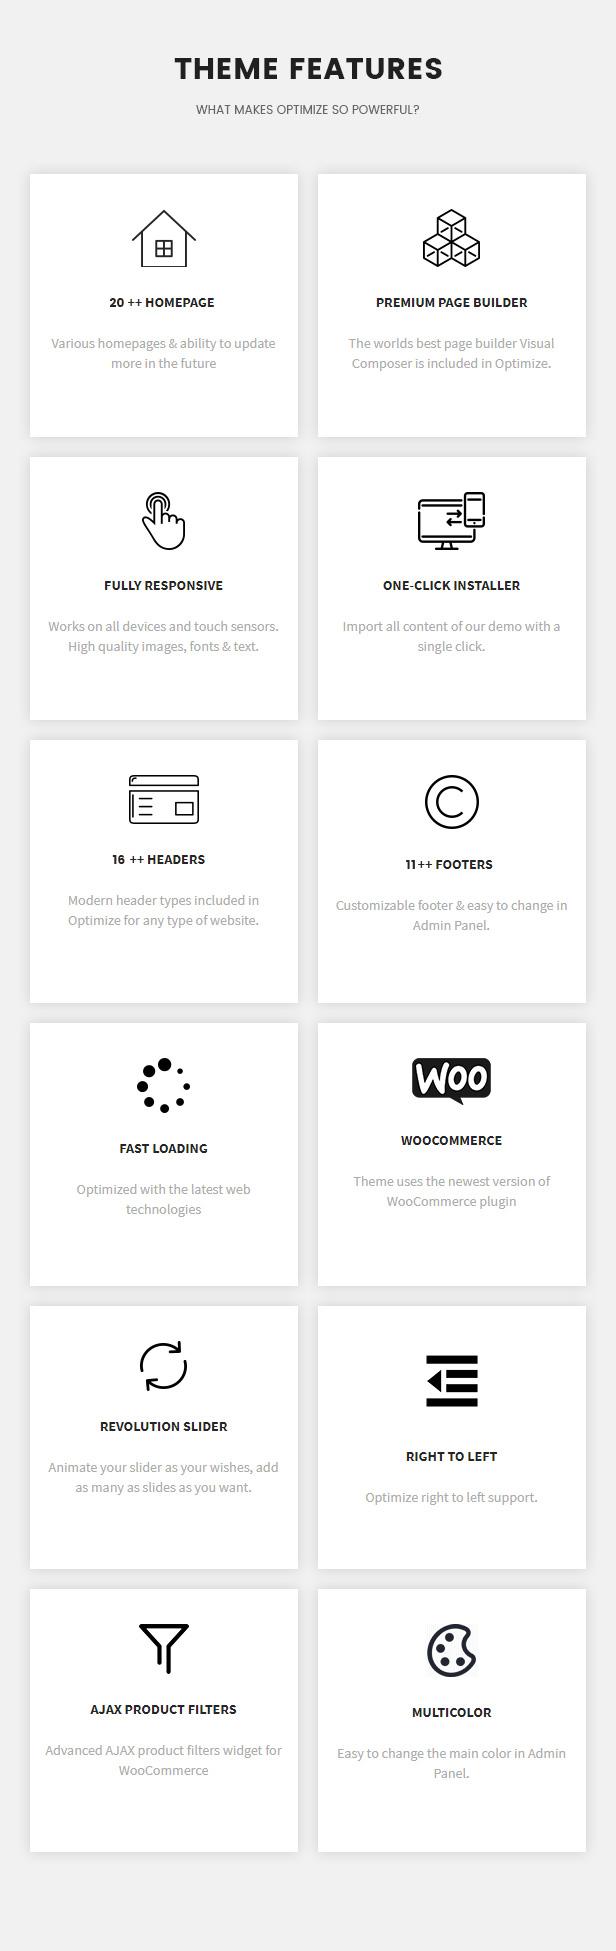 Cariana - WooCommerce Lookbook Fashion Theme - 7